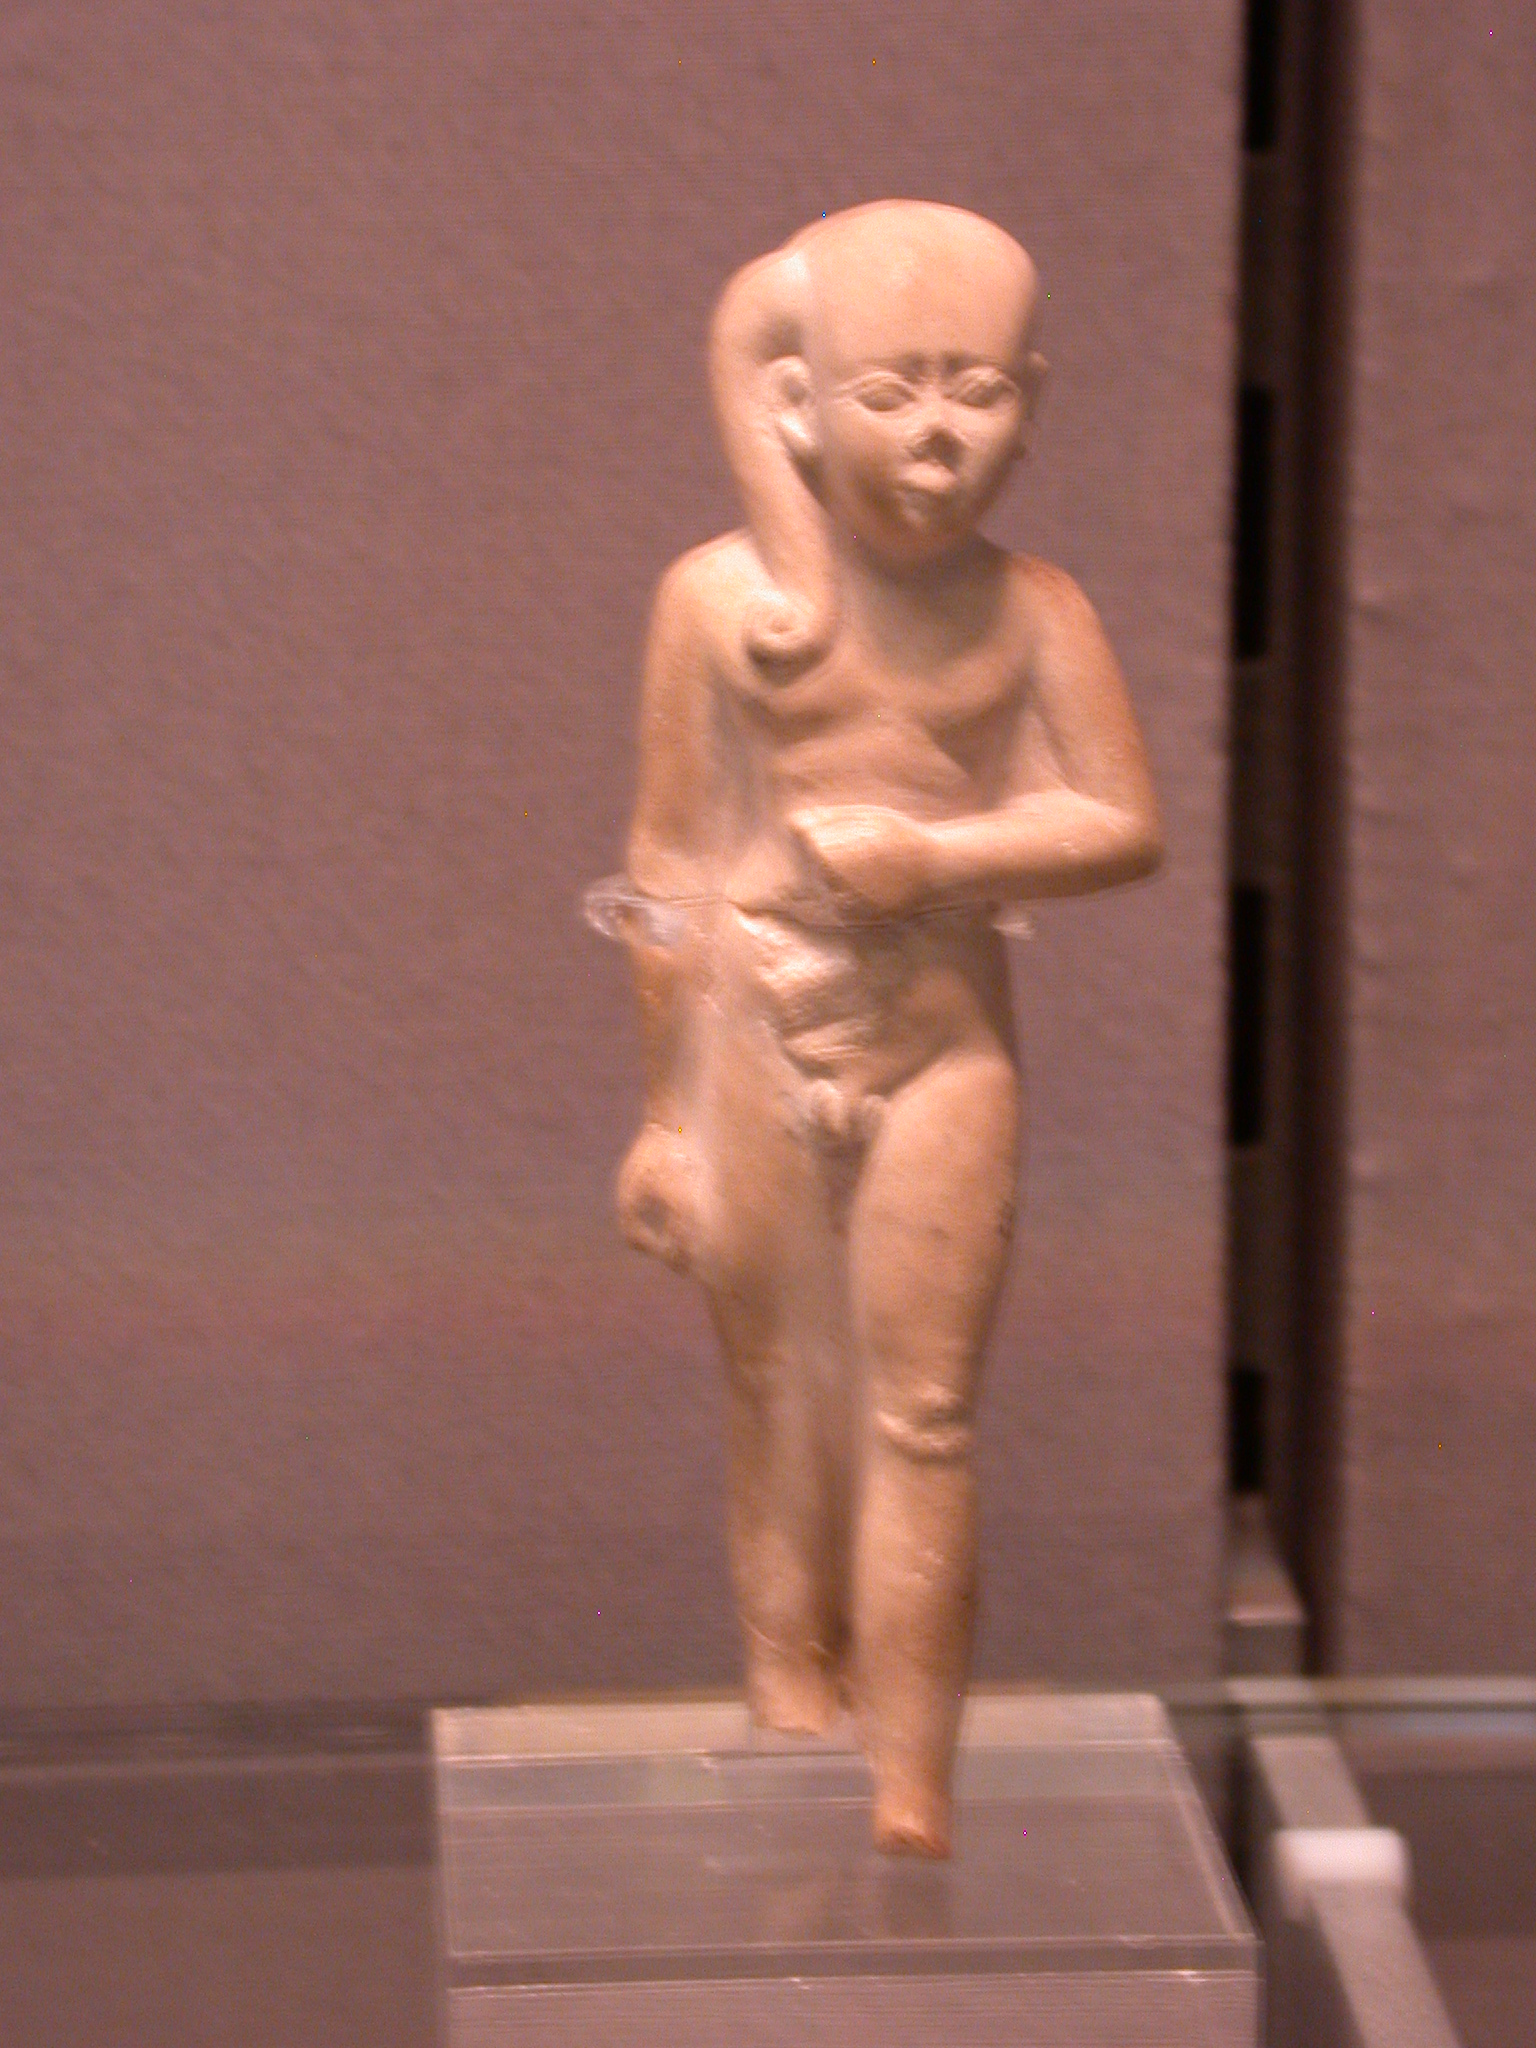 Statuette of Boy Prince or Harpocrates, Limestone, Second Century BCE, Egypt, in Fitzwilliam Museum, Cambridge, England